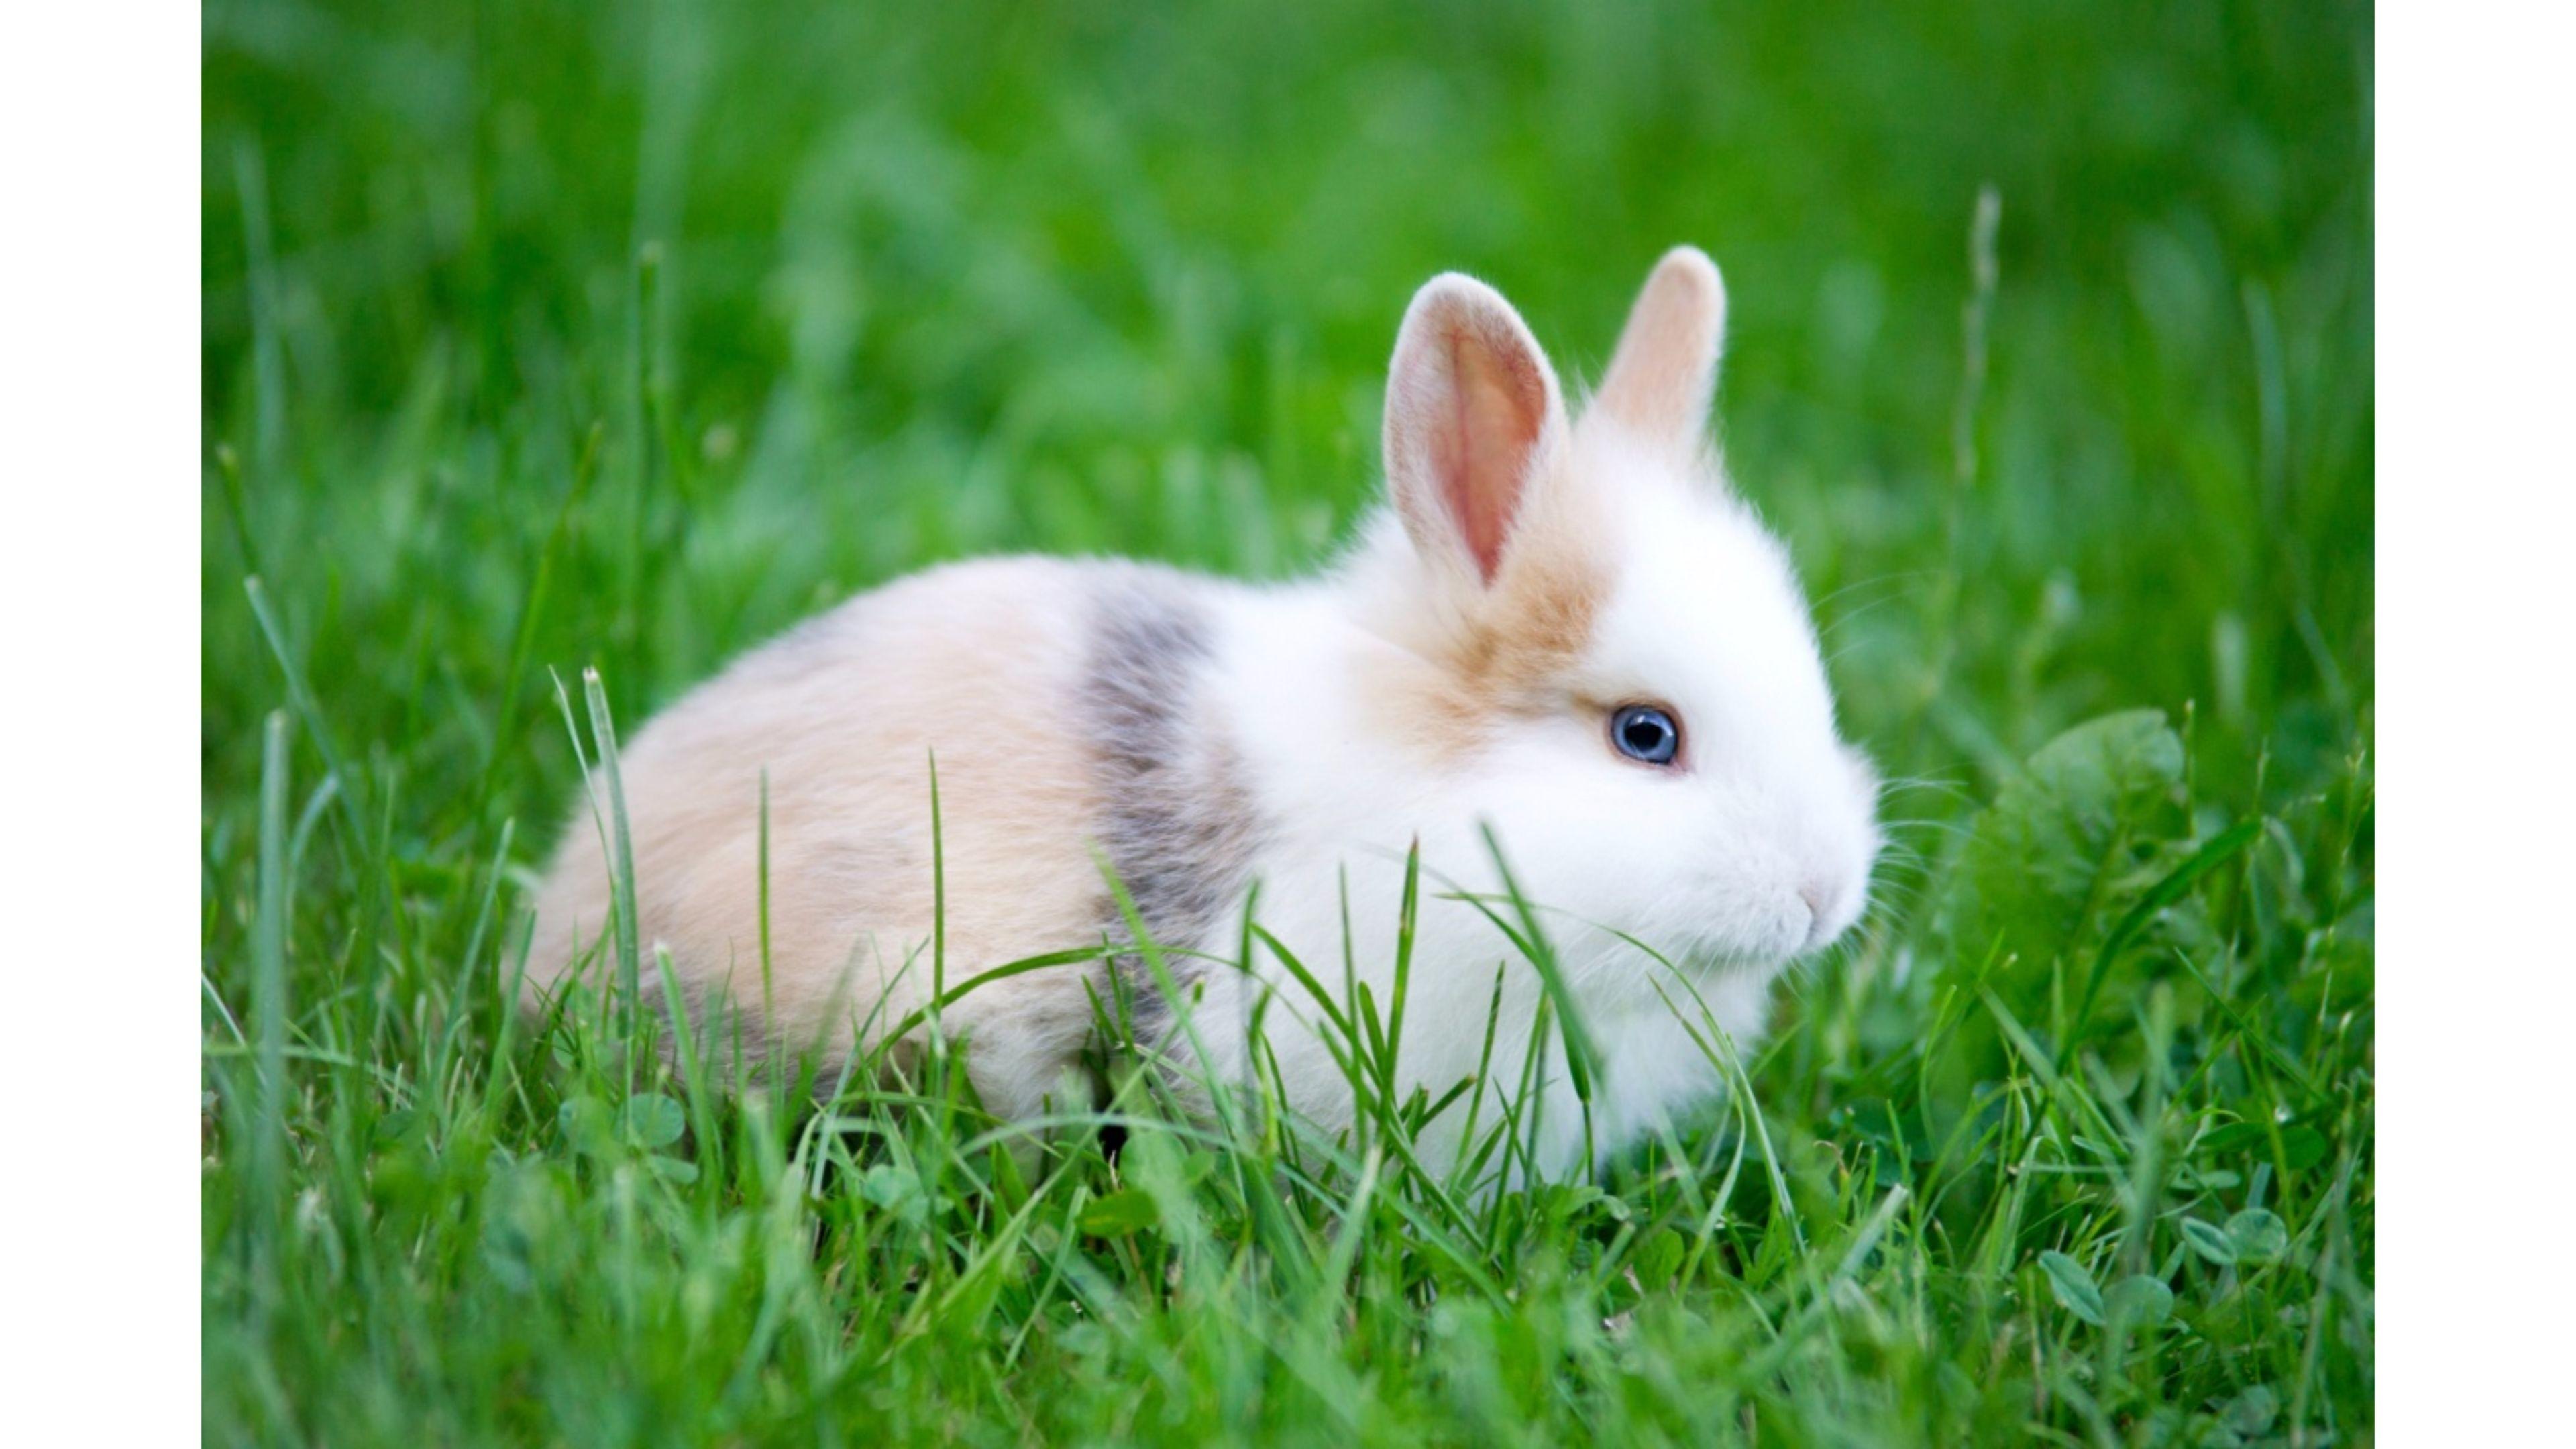 Cute Bunnies Wallpaper (65+ Images